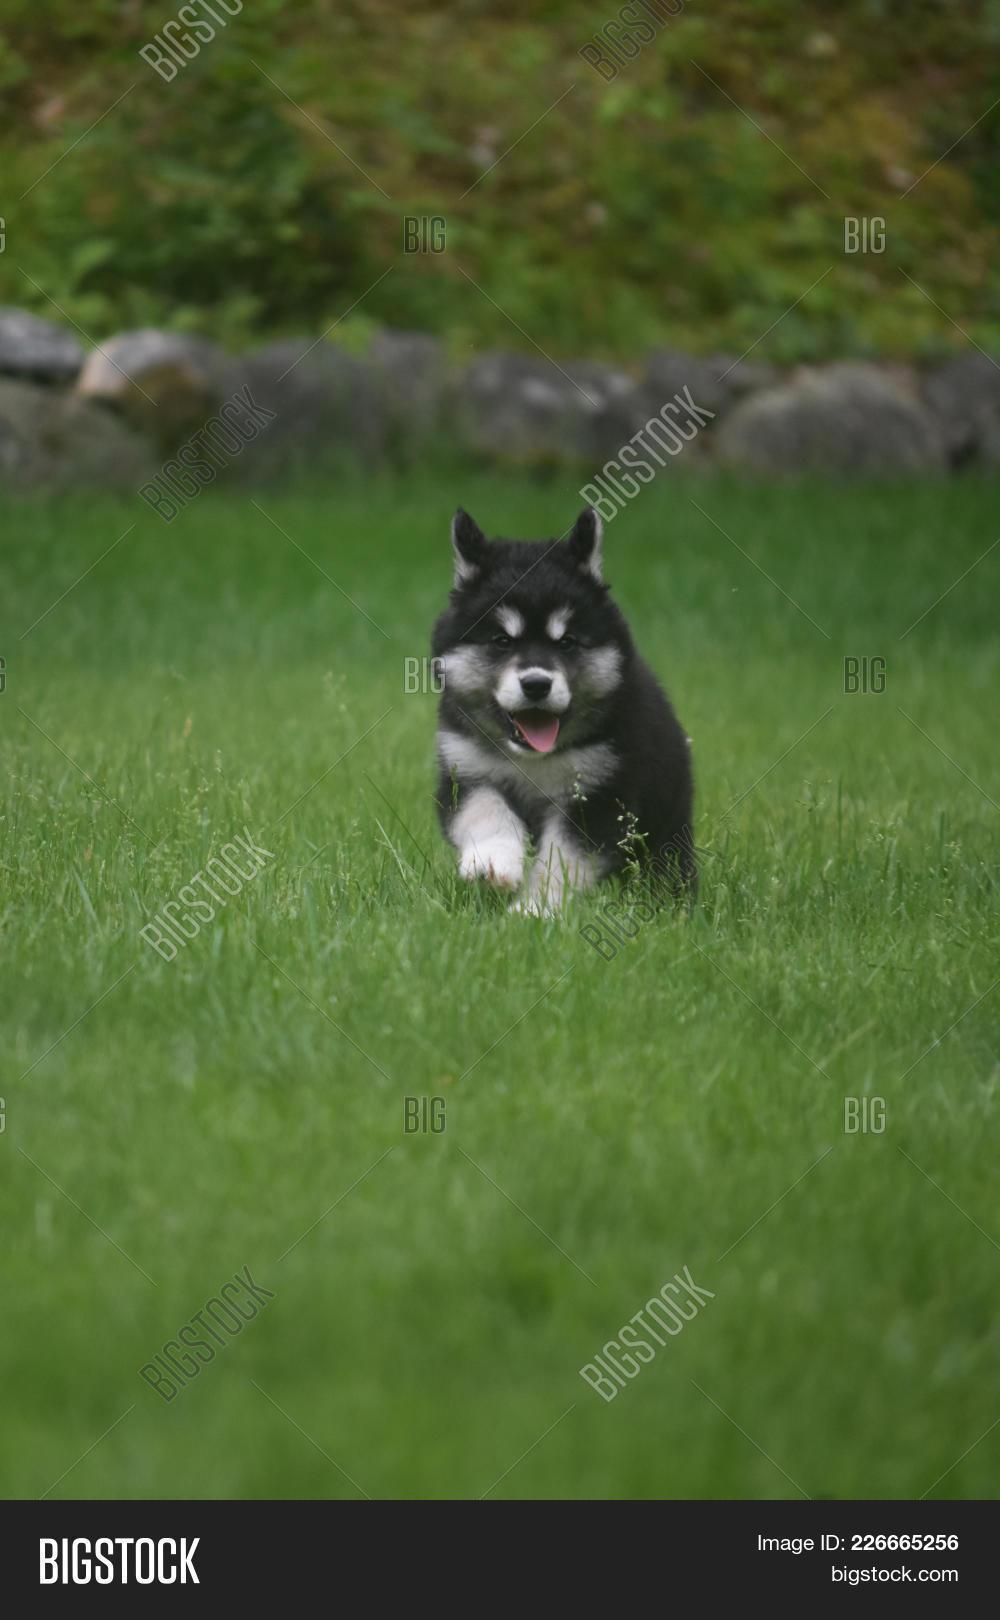 Cute Black White Husky Image Photo Free Trial Bigstock